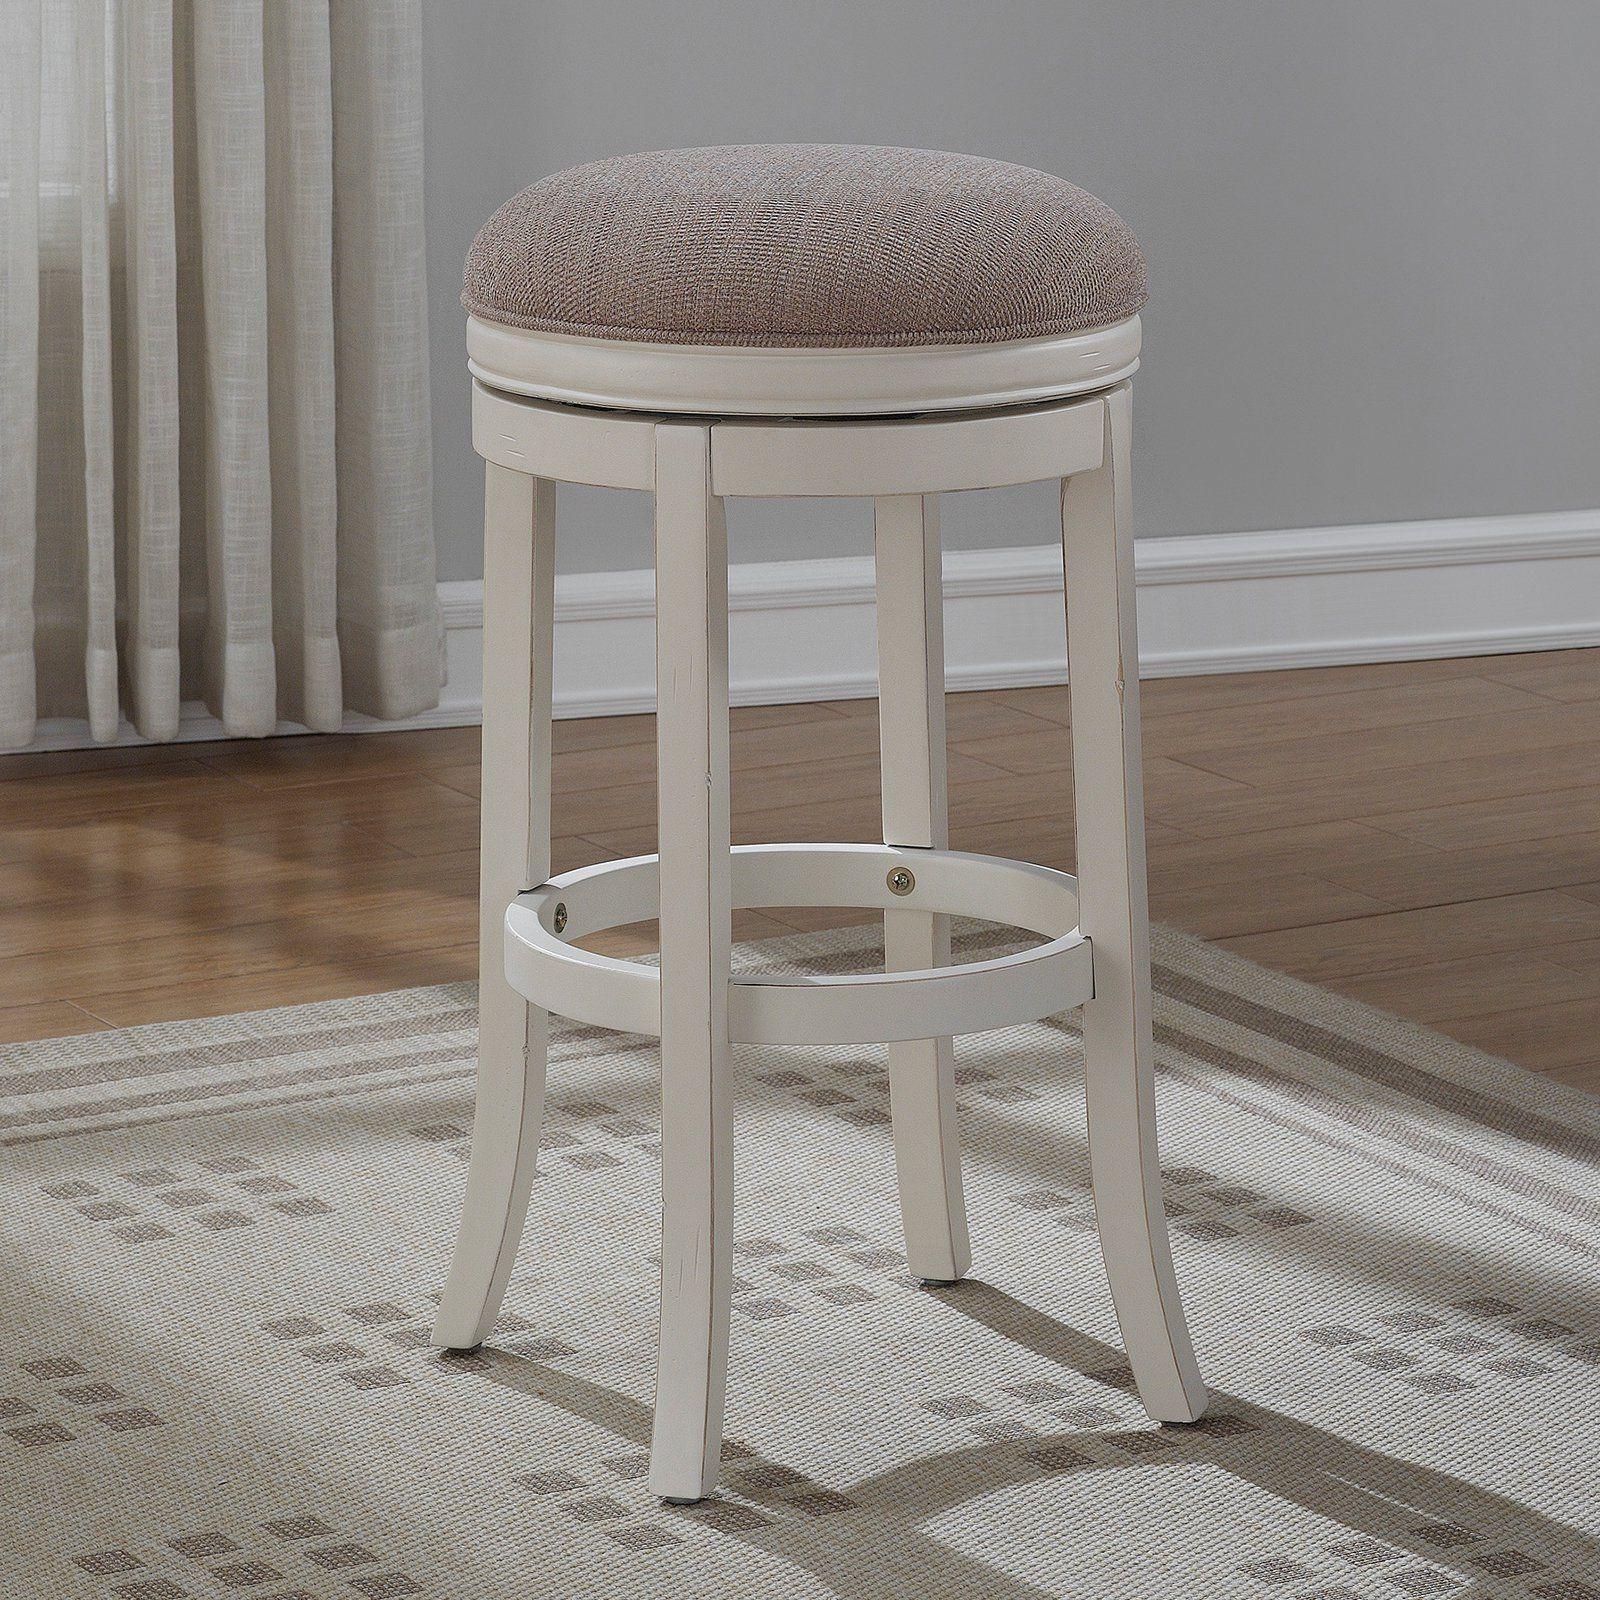 Awe Inspiring American Woodcrafters Aversa Backless Swivel Counter Stool Machost Co Dining Chair Design Ideas Machostcouk